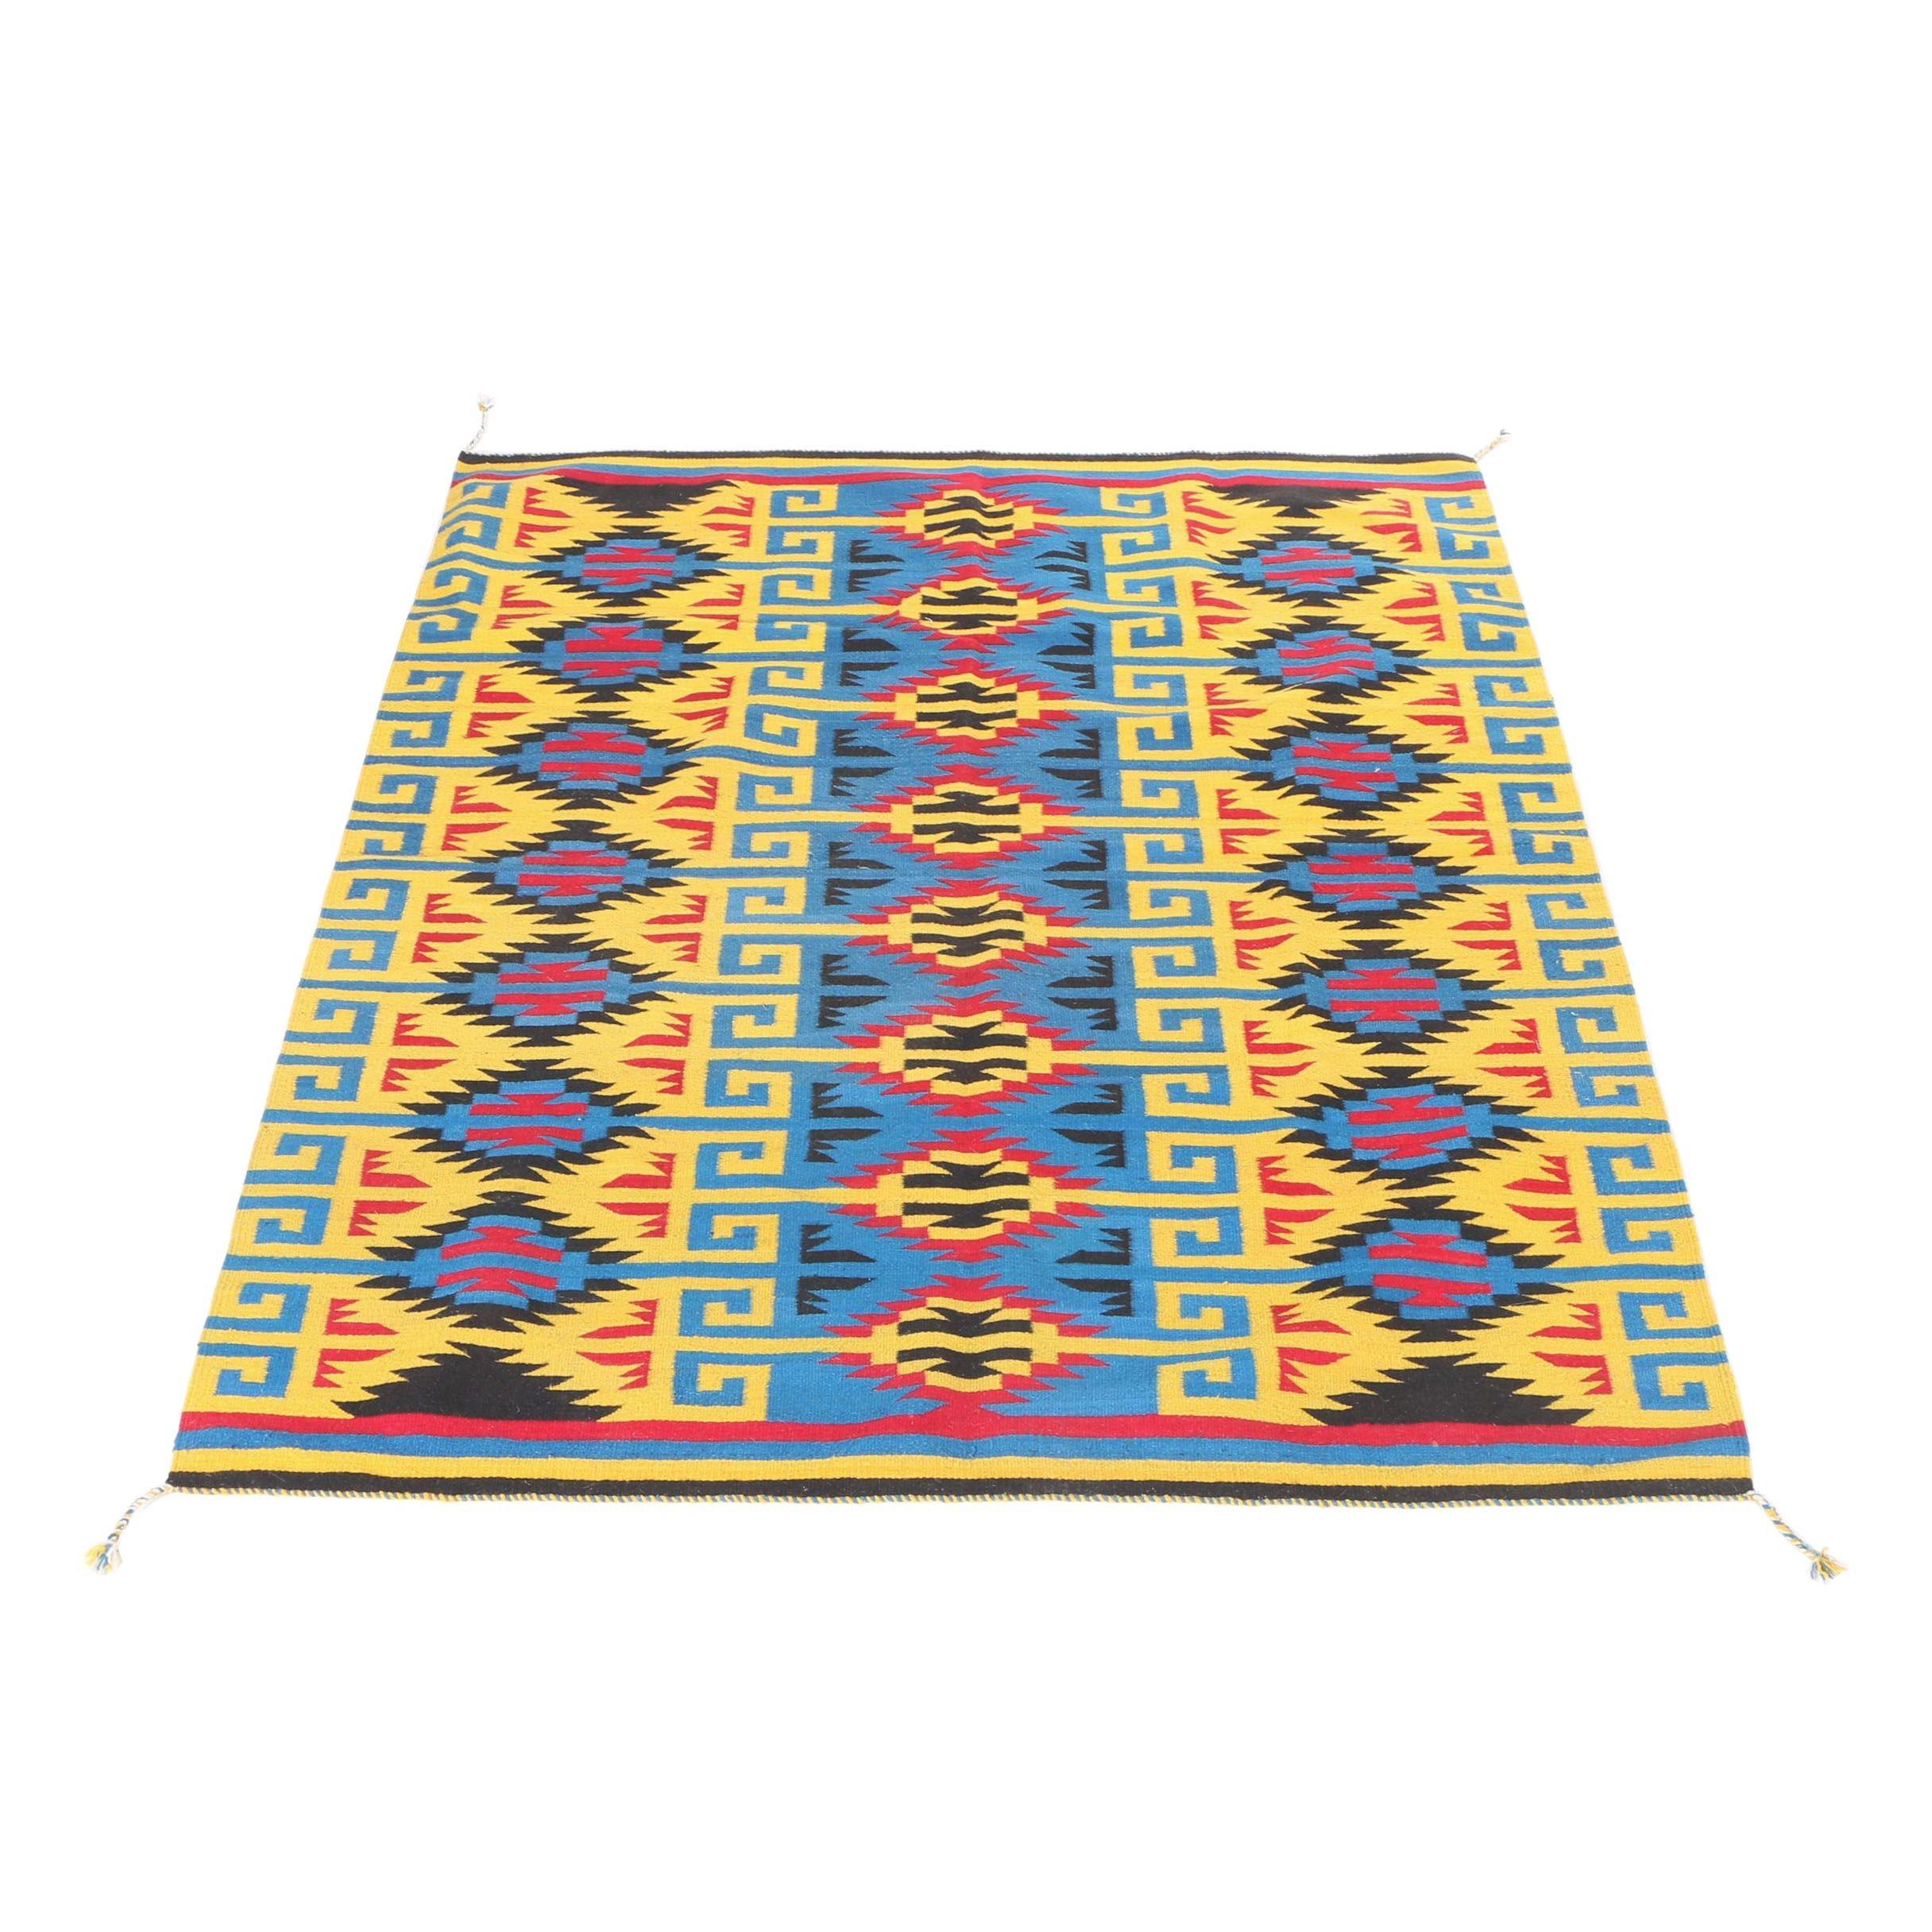 Native American Style Handwoven Wool Rug